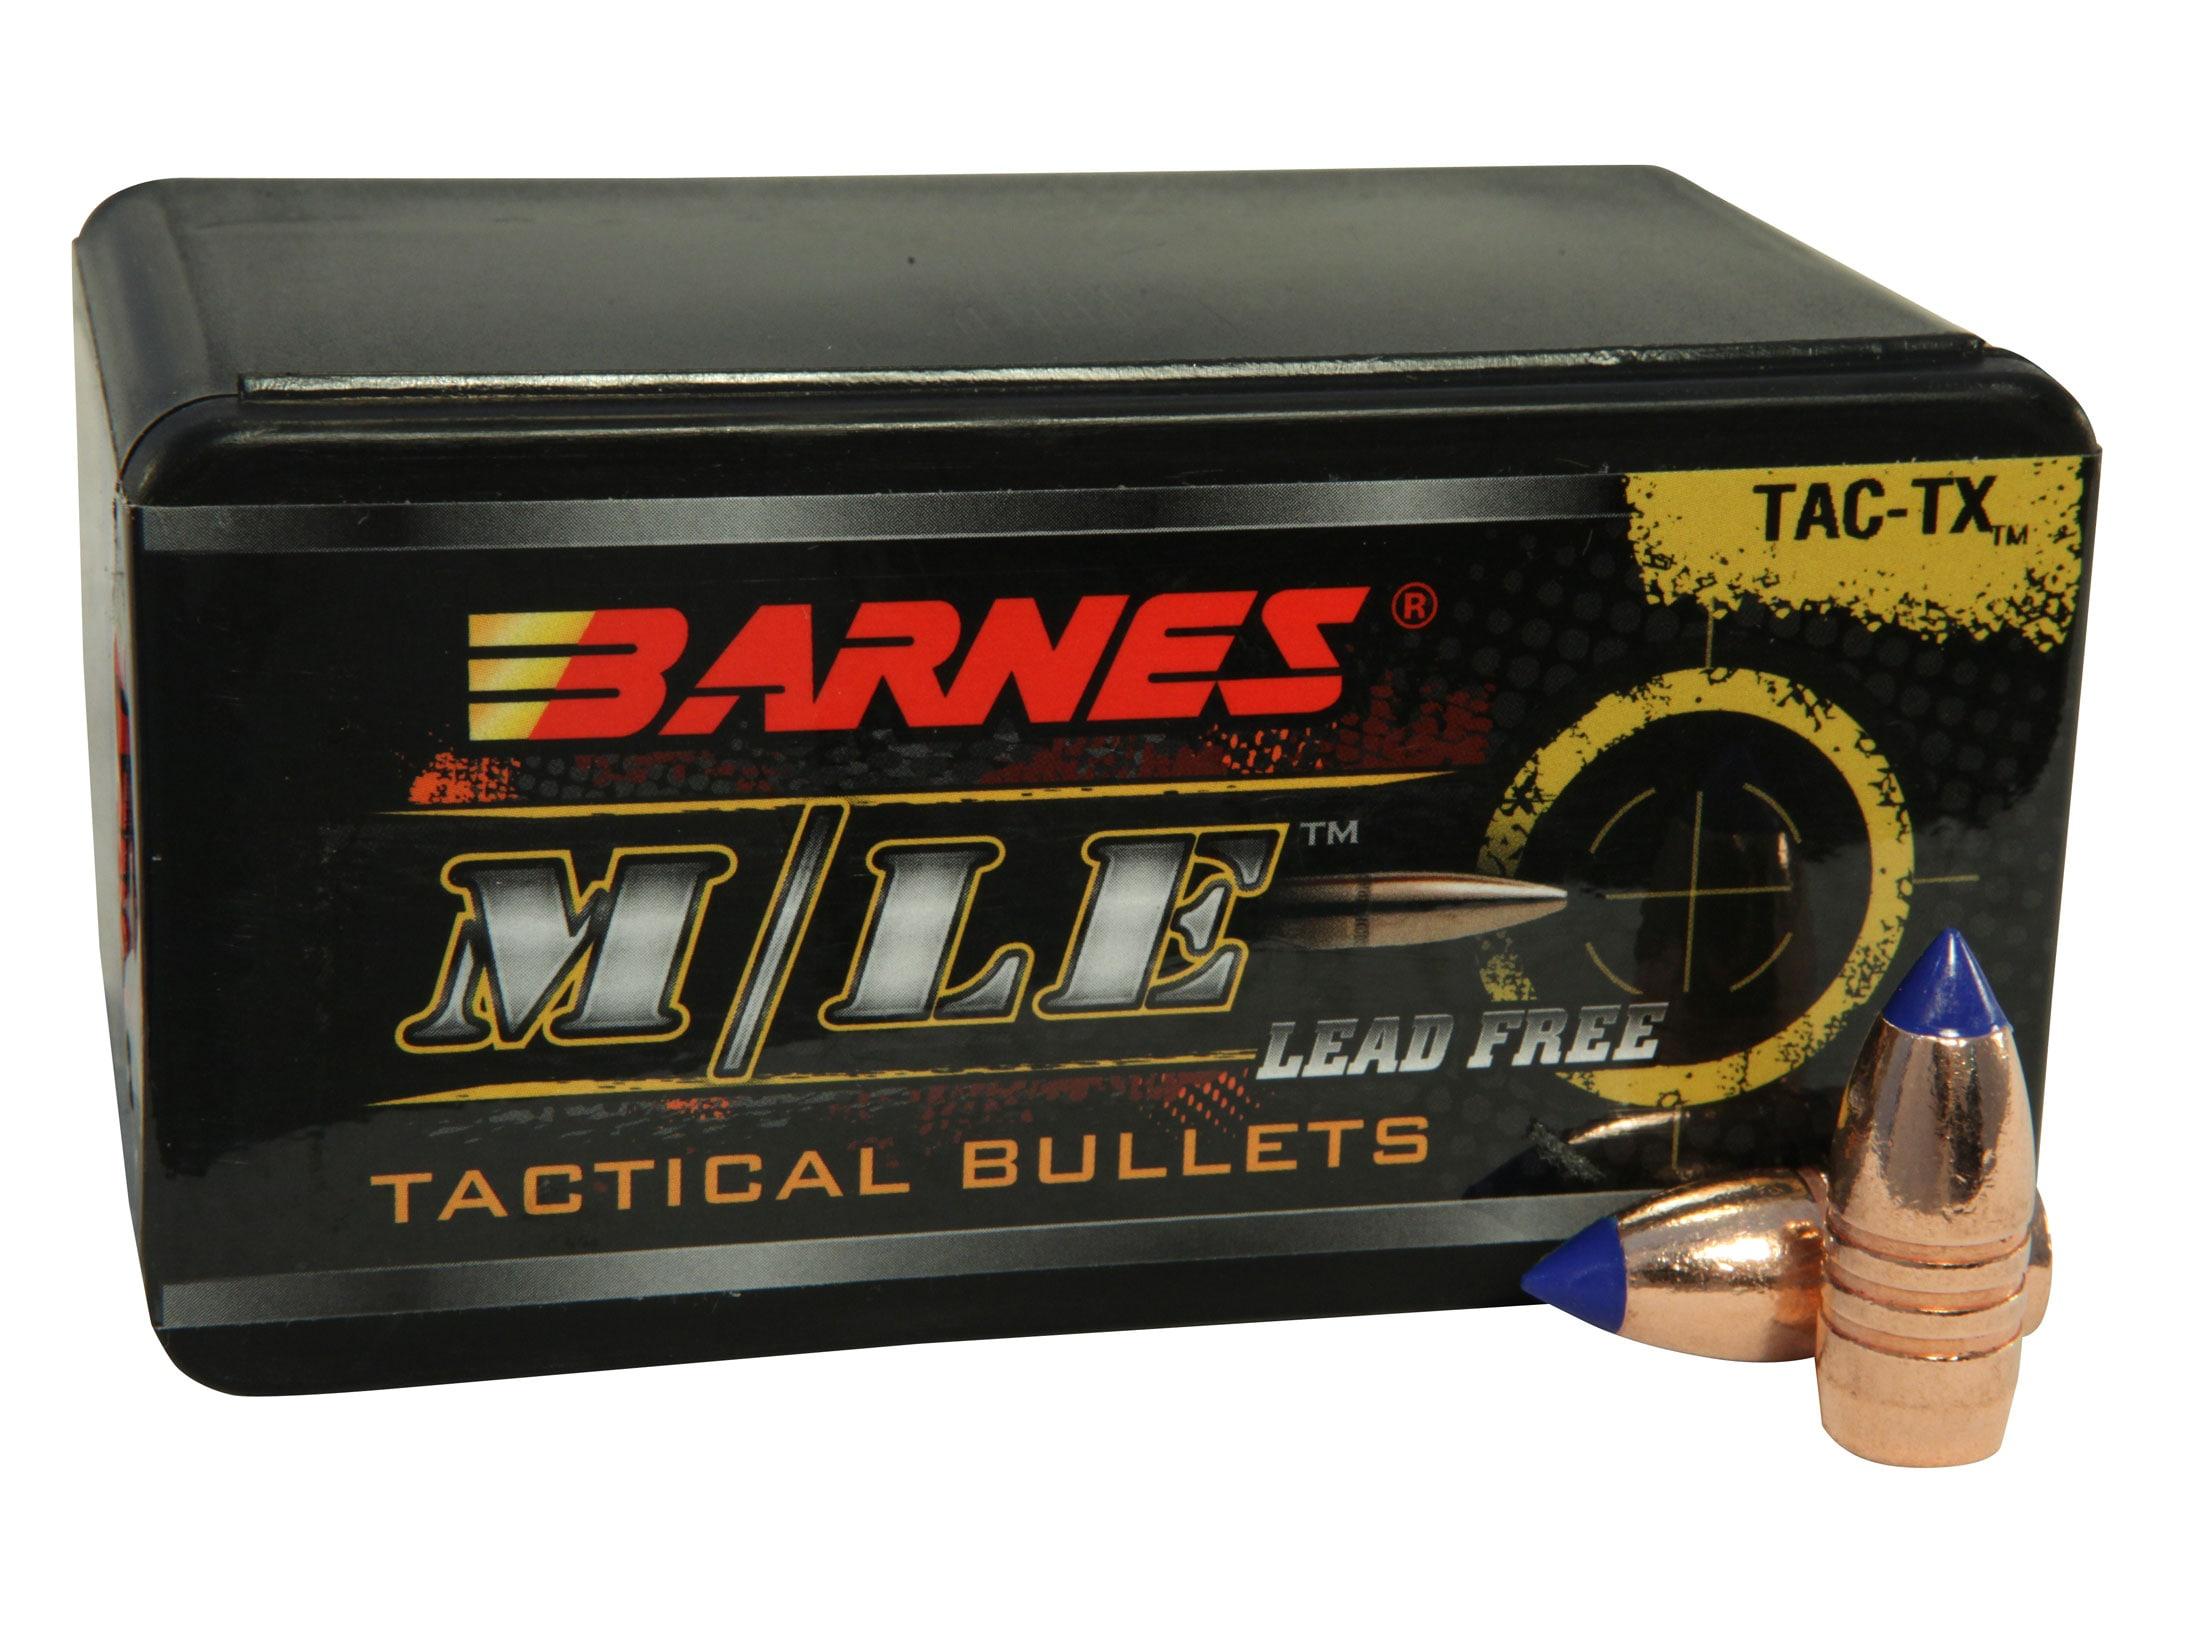 Barnes Tipped TAC-TX Bullets 458 SOCOM (458 Diameter) 300 Grain Boat